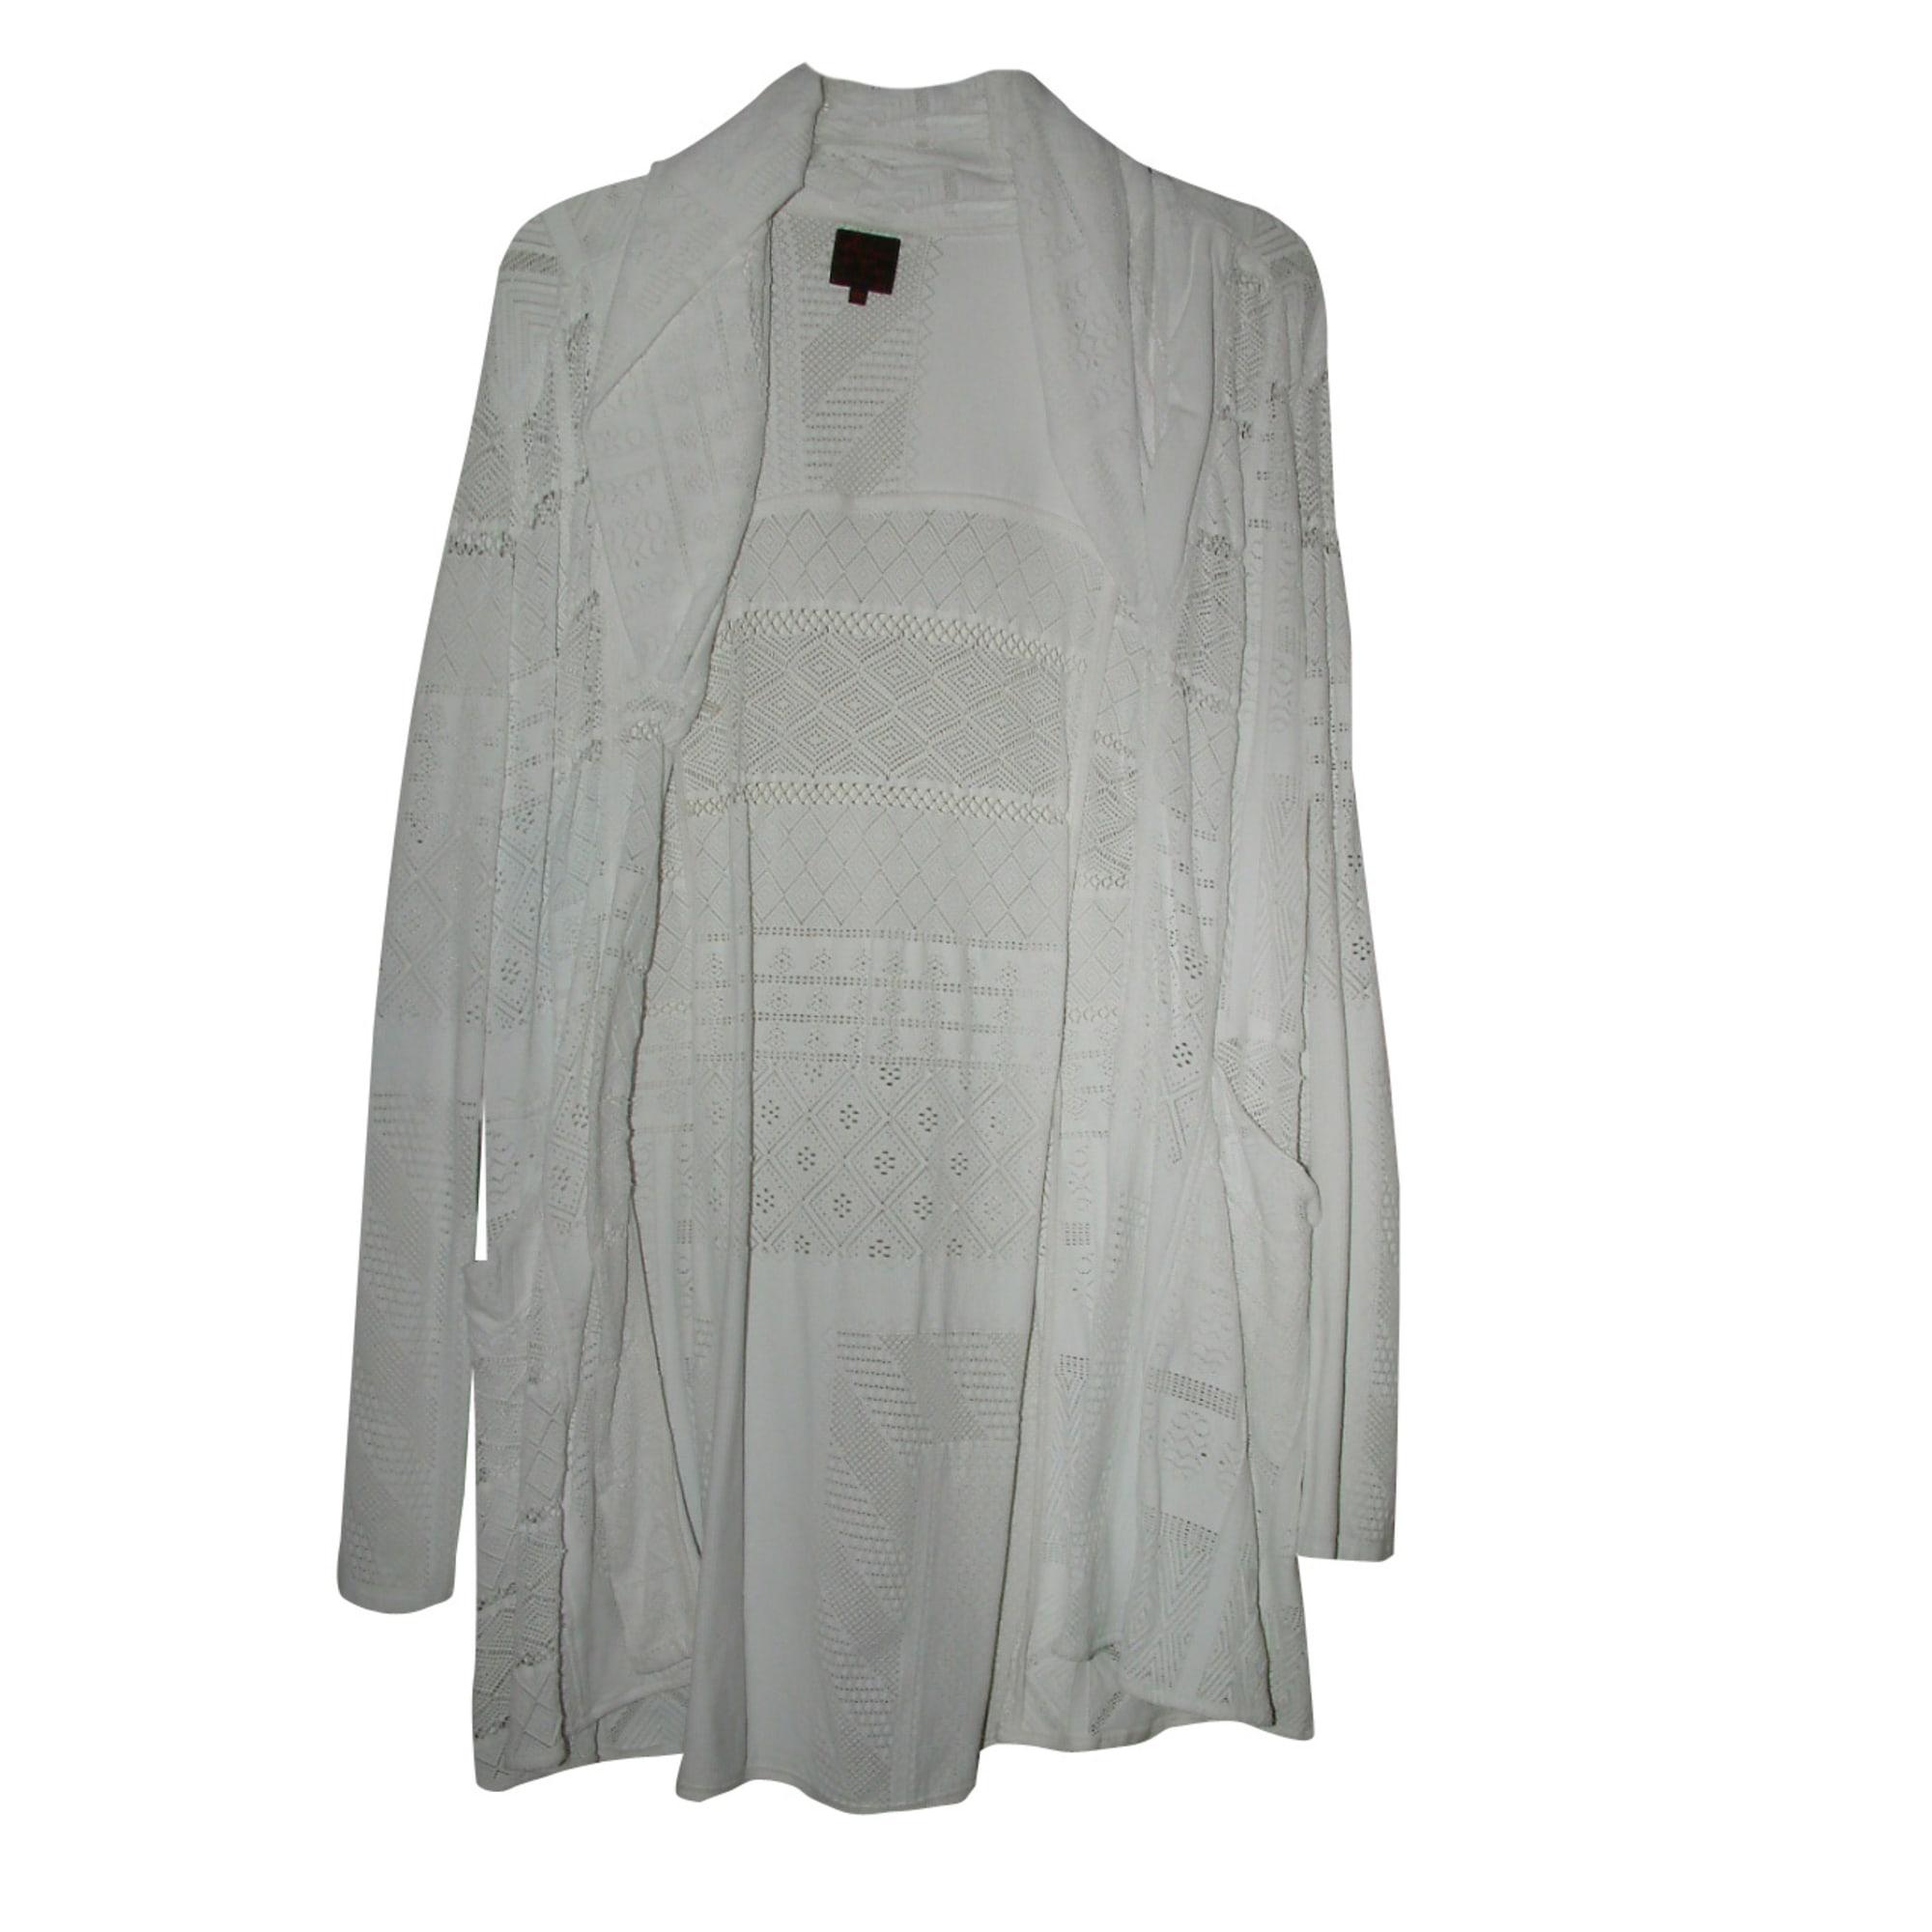 Vest, Cardigan AVENTURES DES TOILES White, off-white, ecru